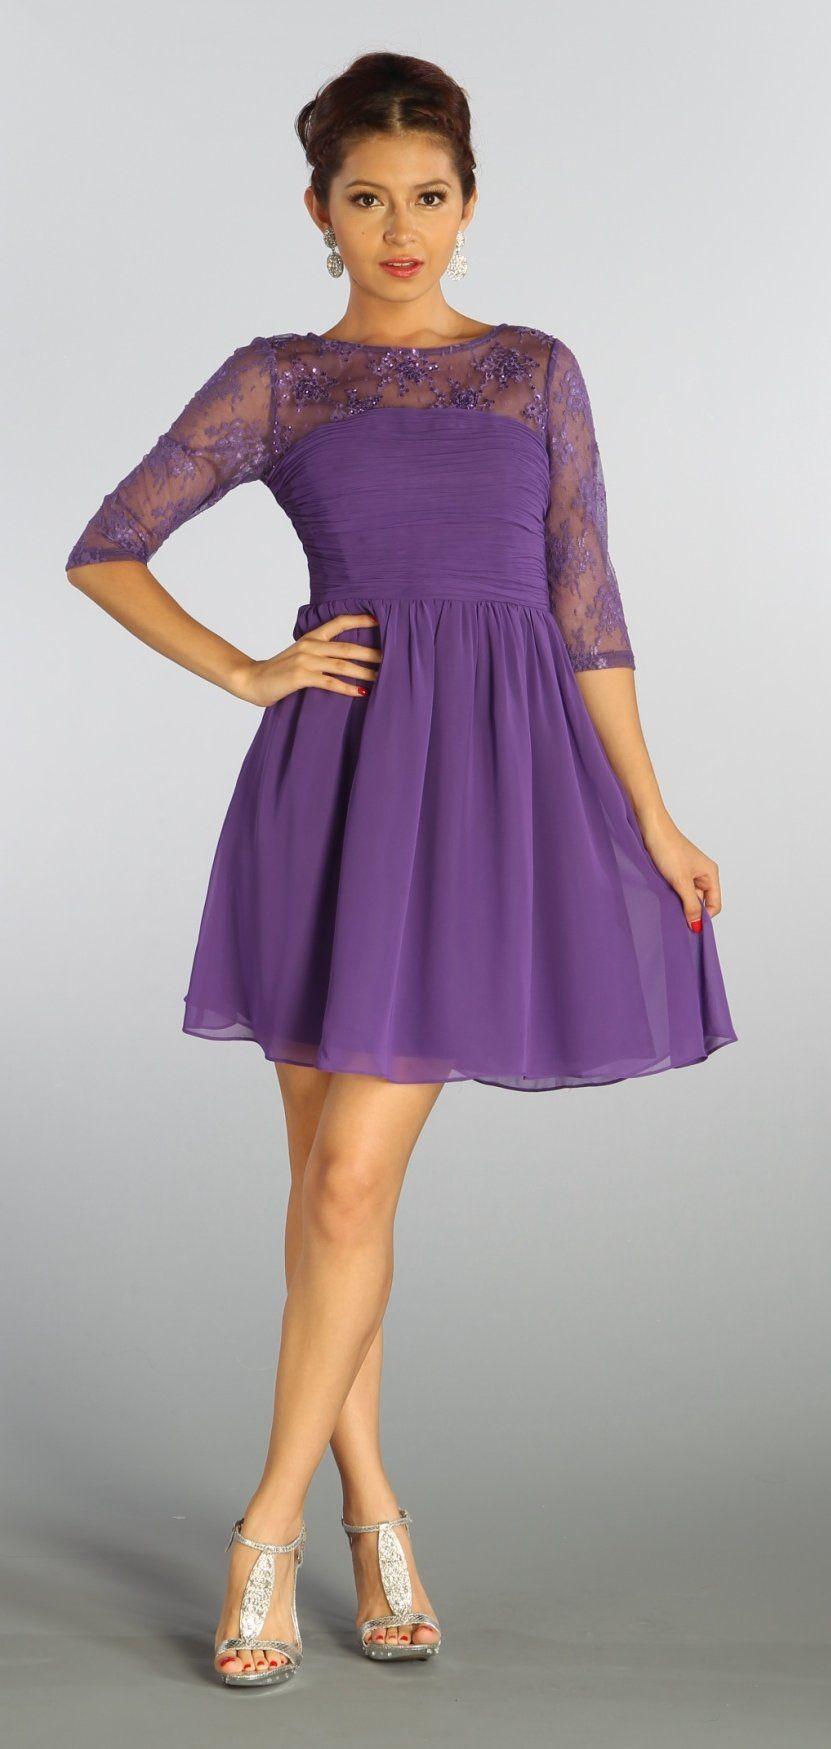 Mid length dresses for wedding guests  Illusion Neck Mid Length Sleeves Purple Graduation Dress Chiffon